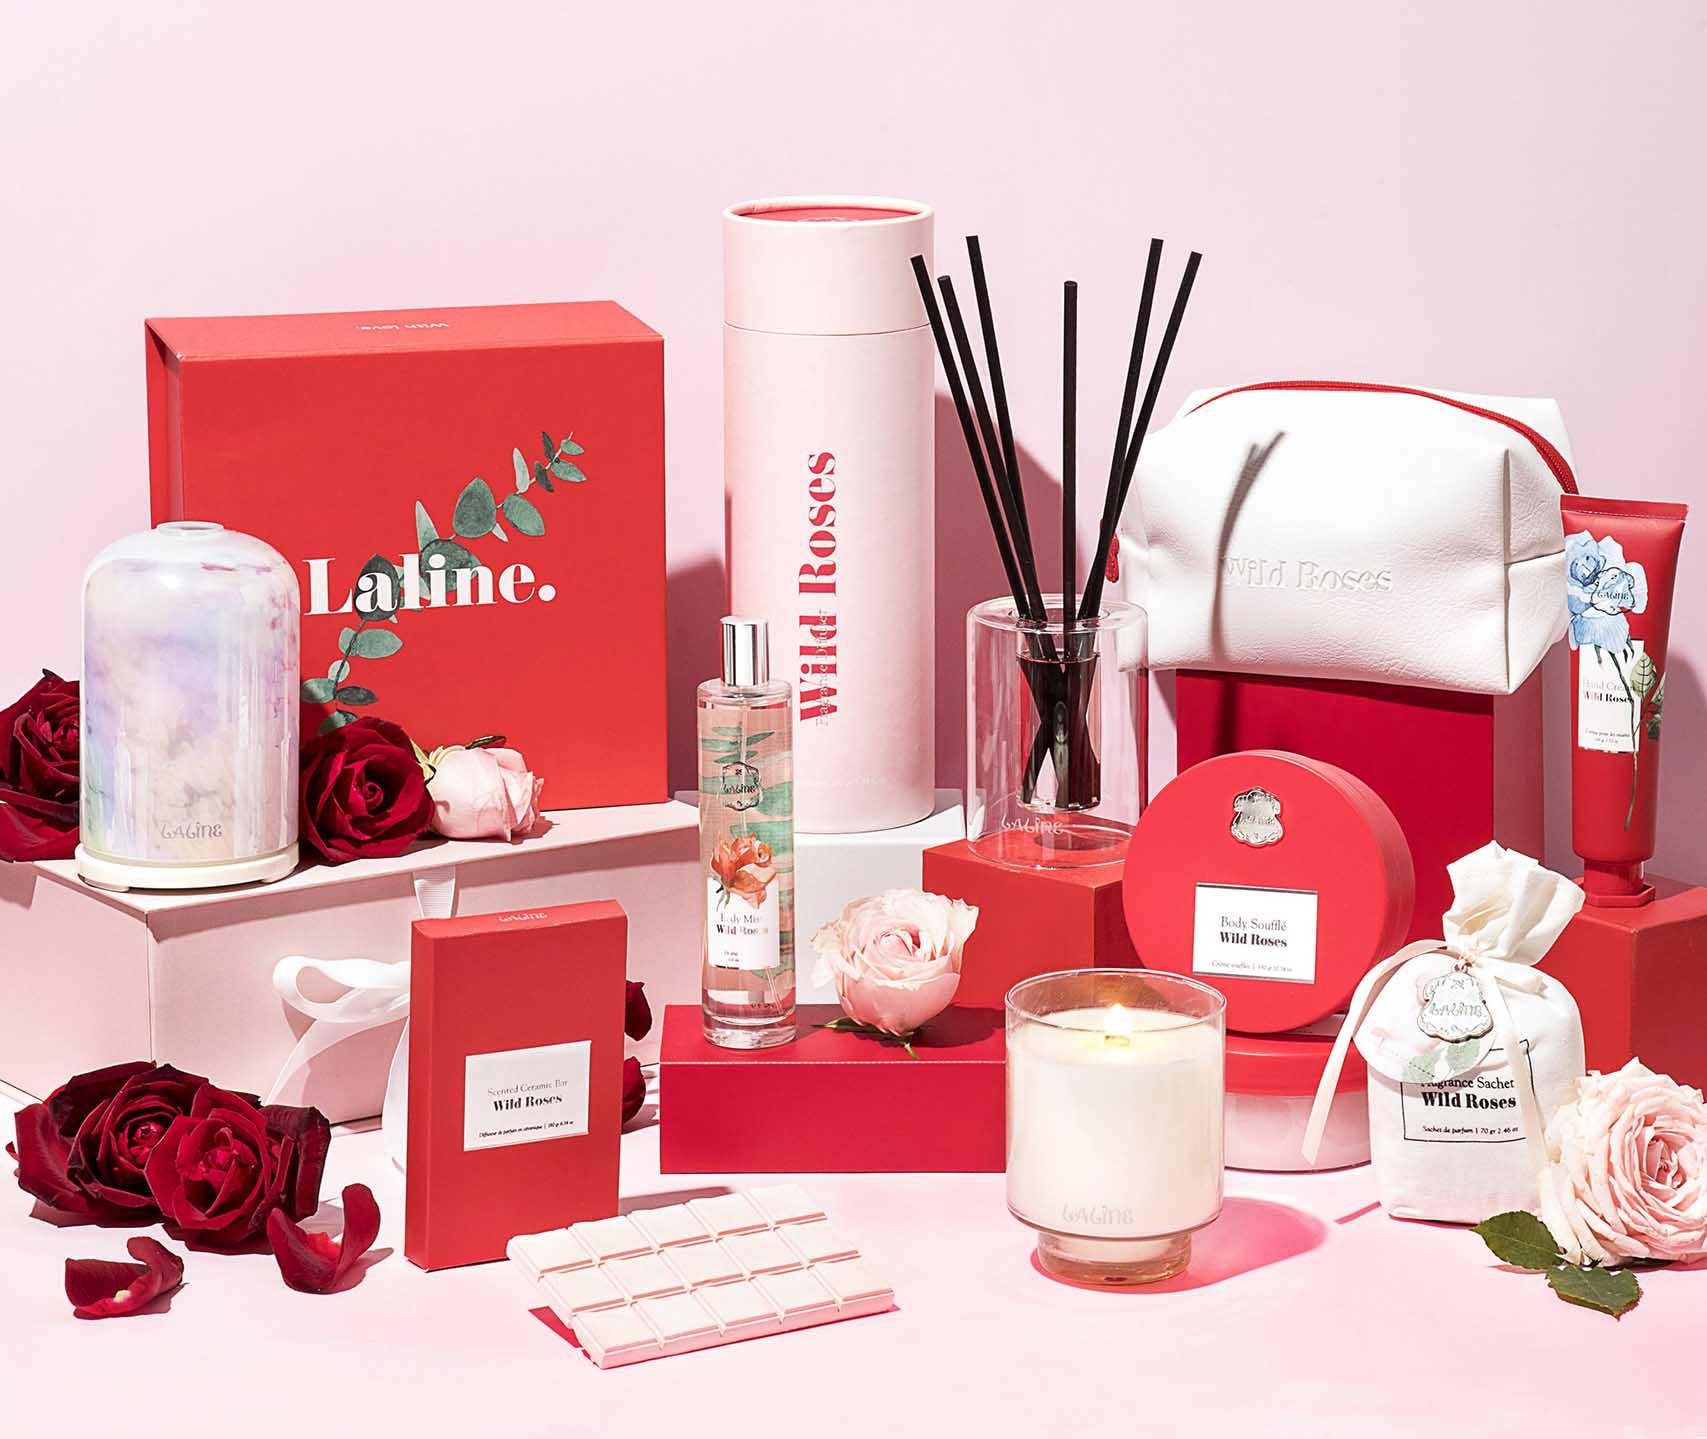 Valentine's Day 2020, ללין קולקציית WILD ROSES צילום תמוז רחמן